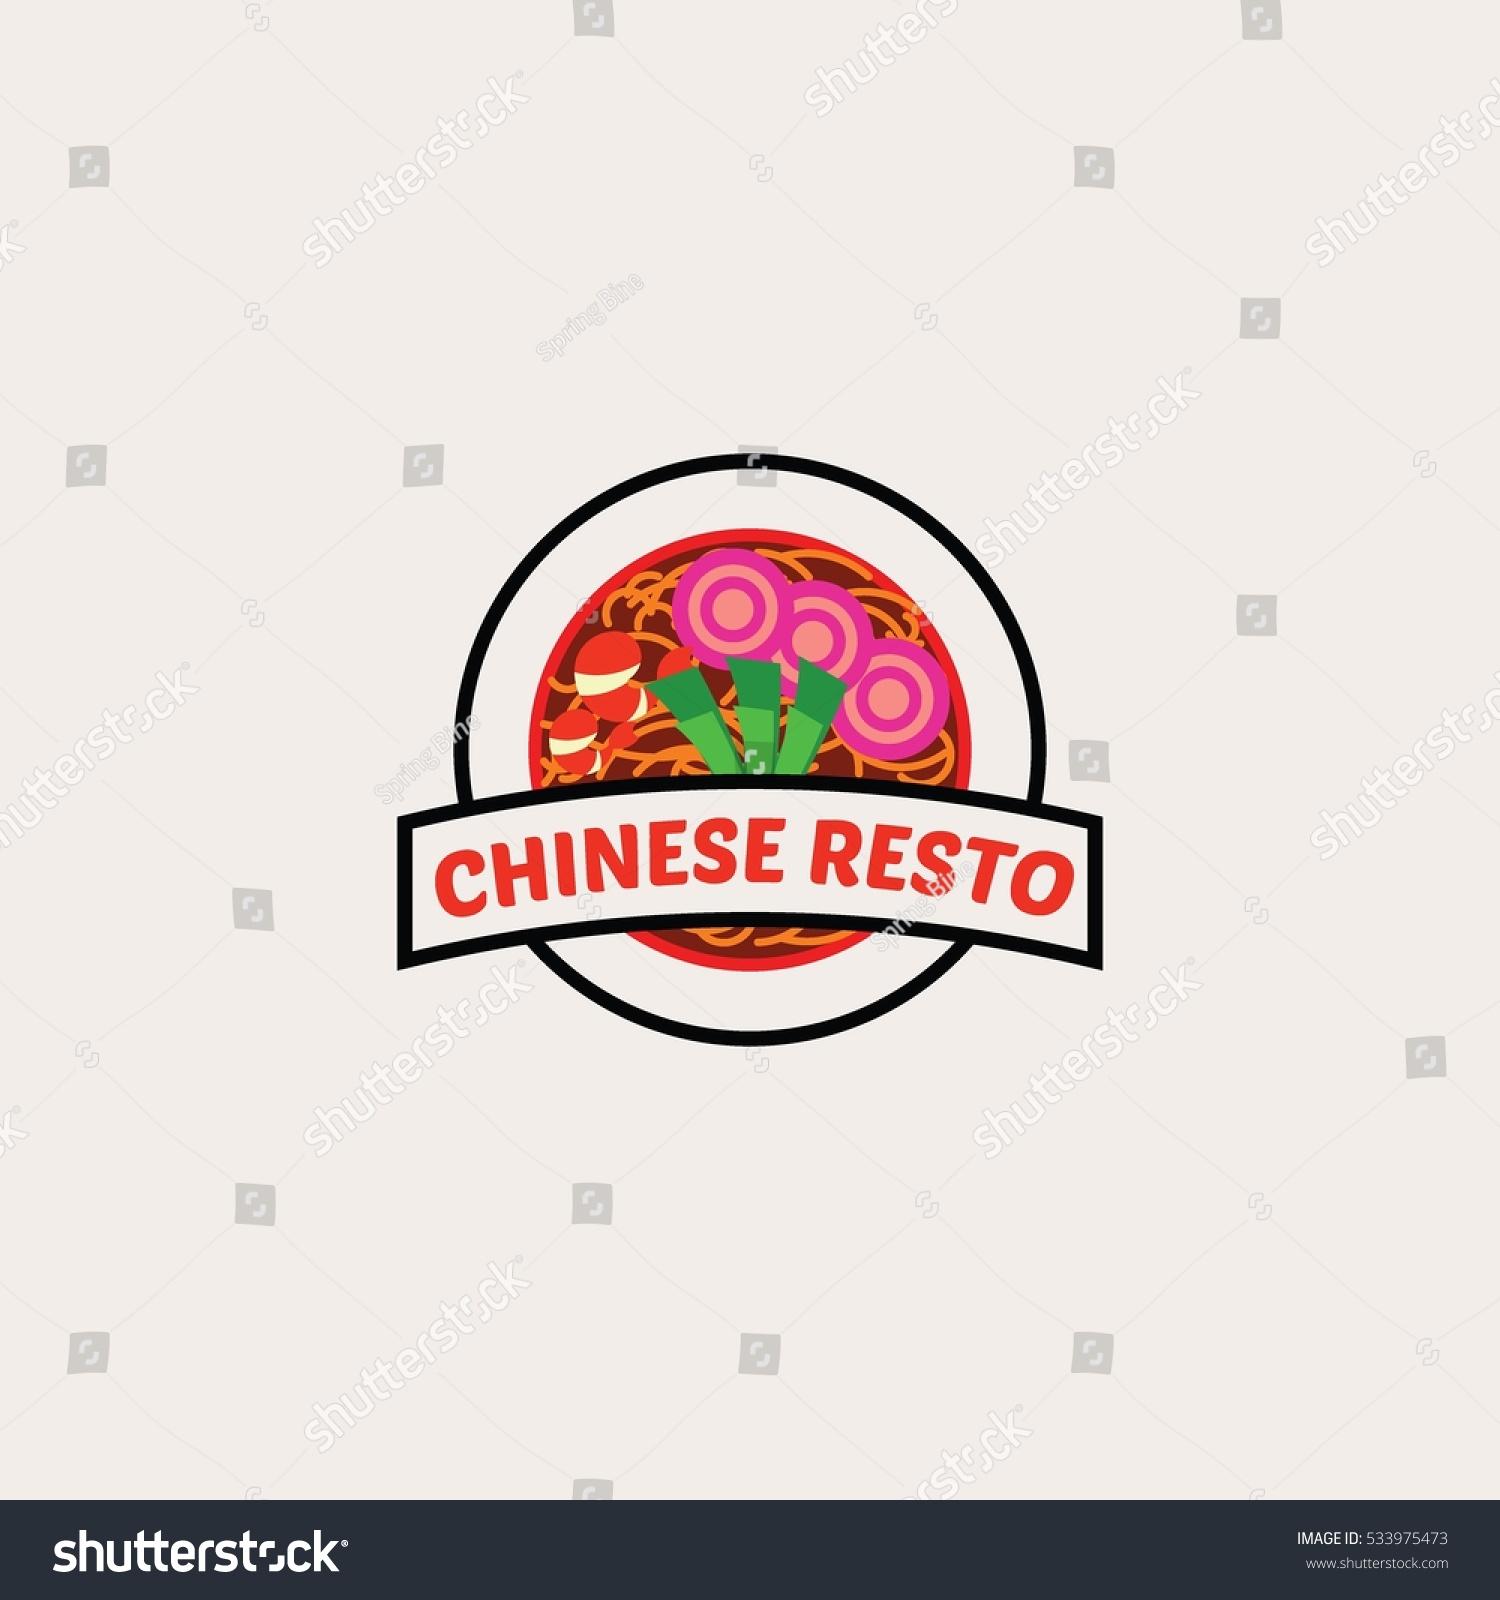 Chinese restaurant logo design template vector stock